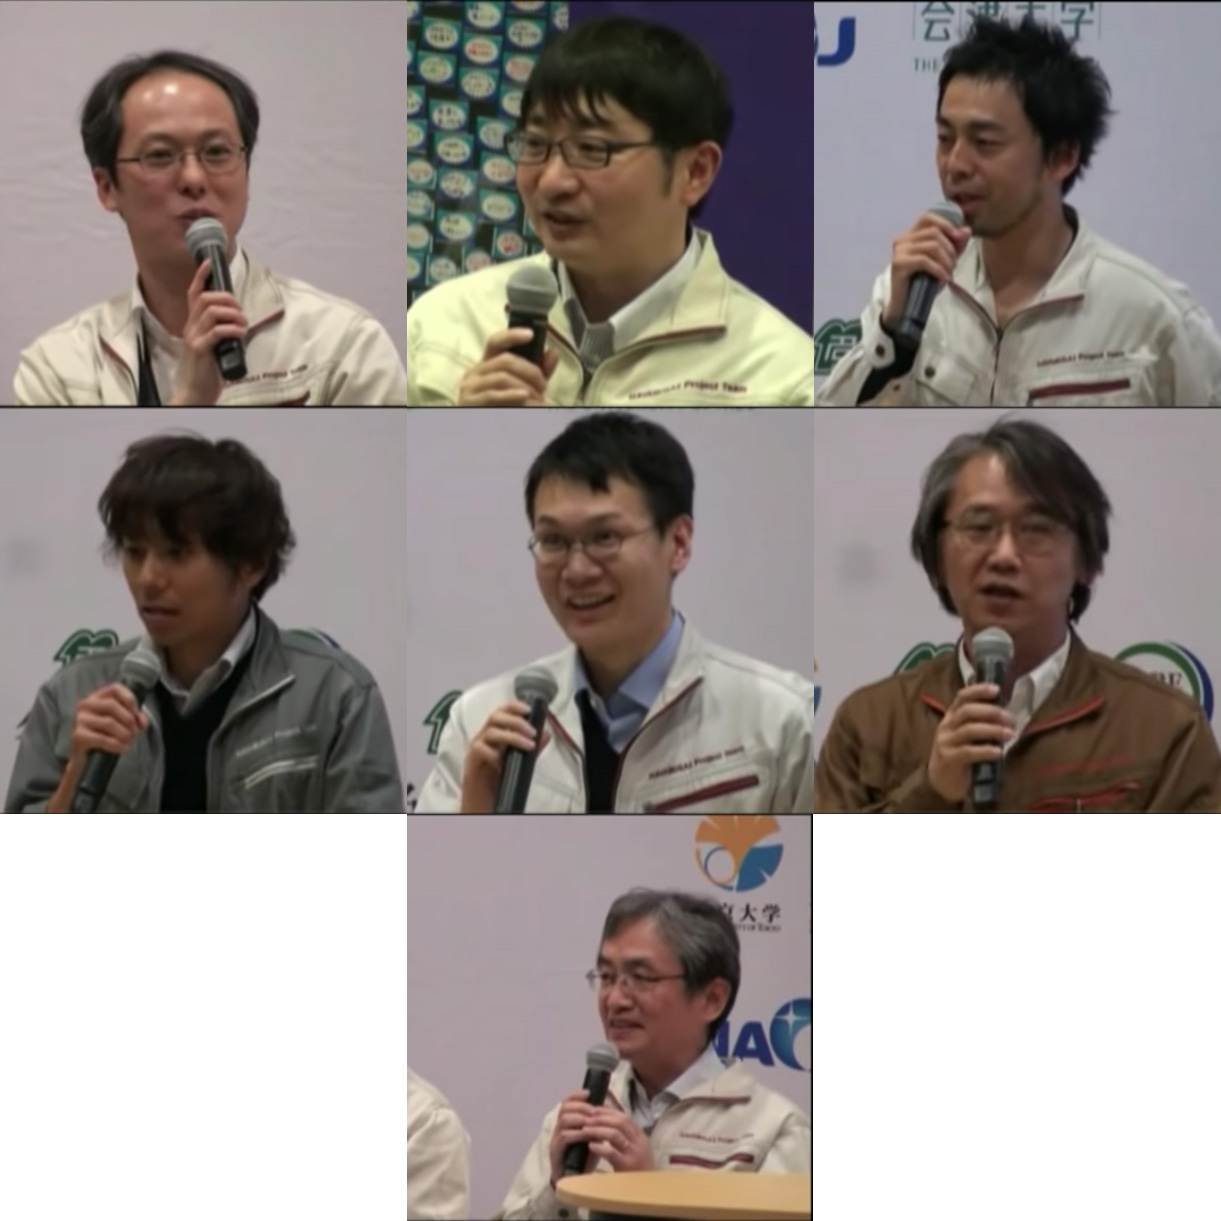 f:id:Imamura:20190408132101j:plain